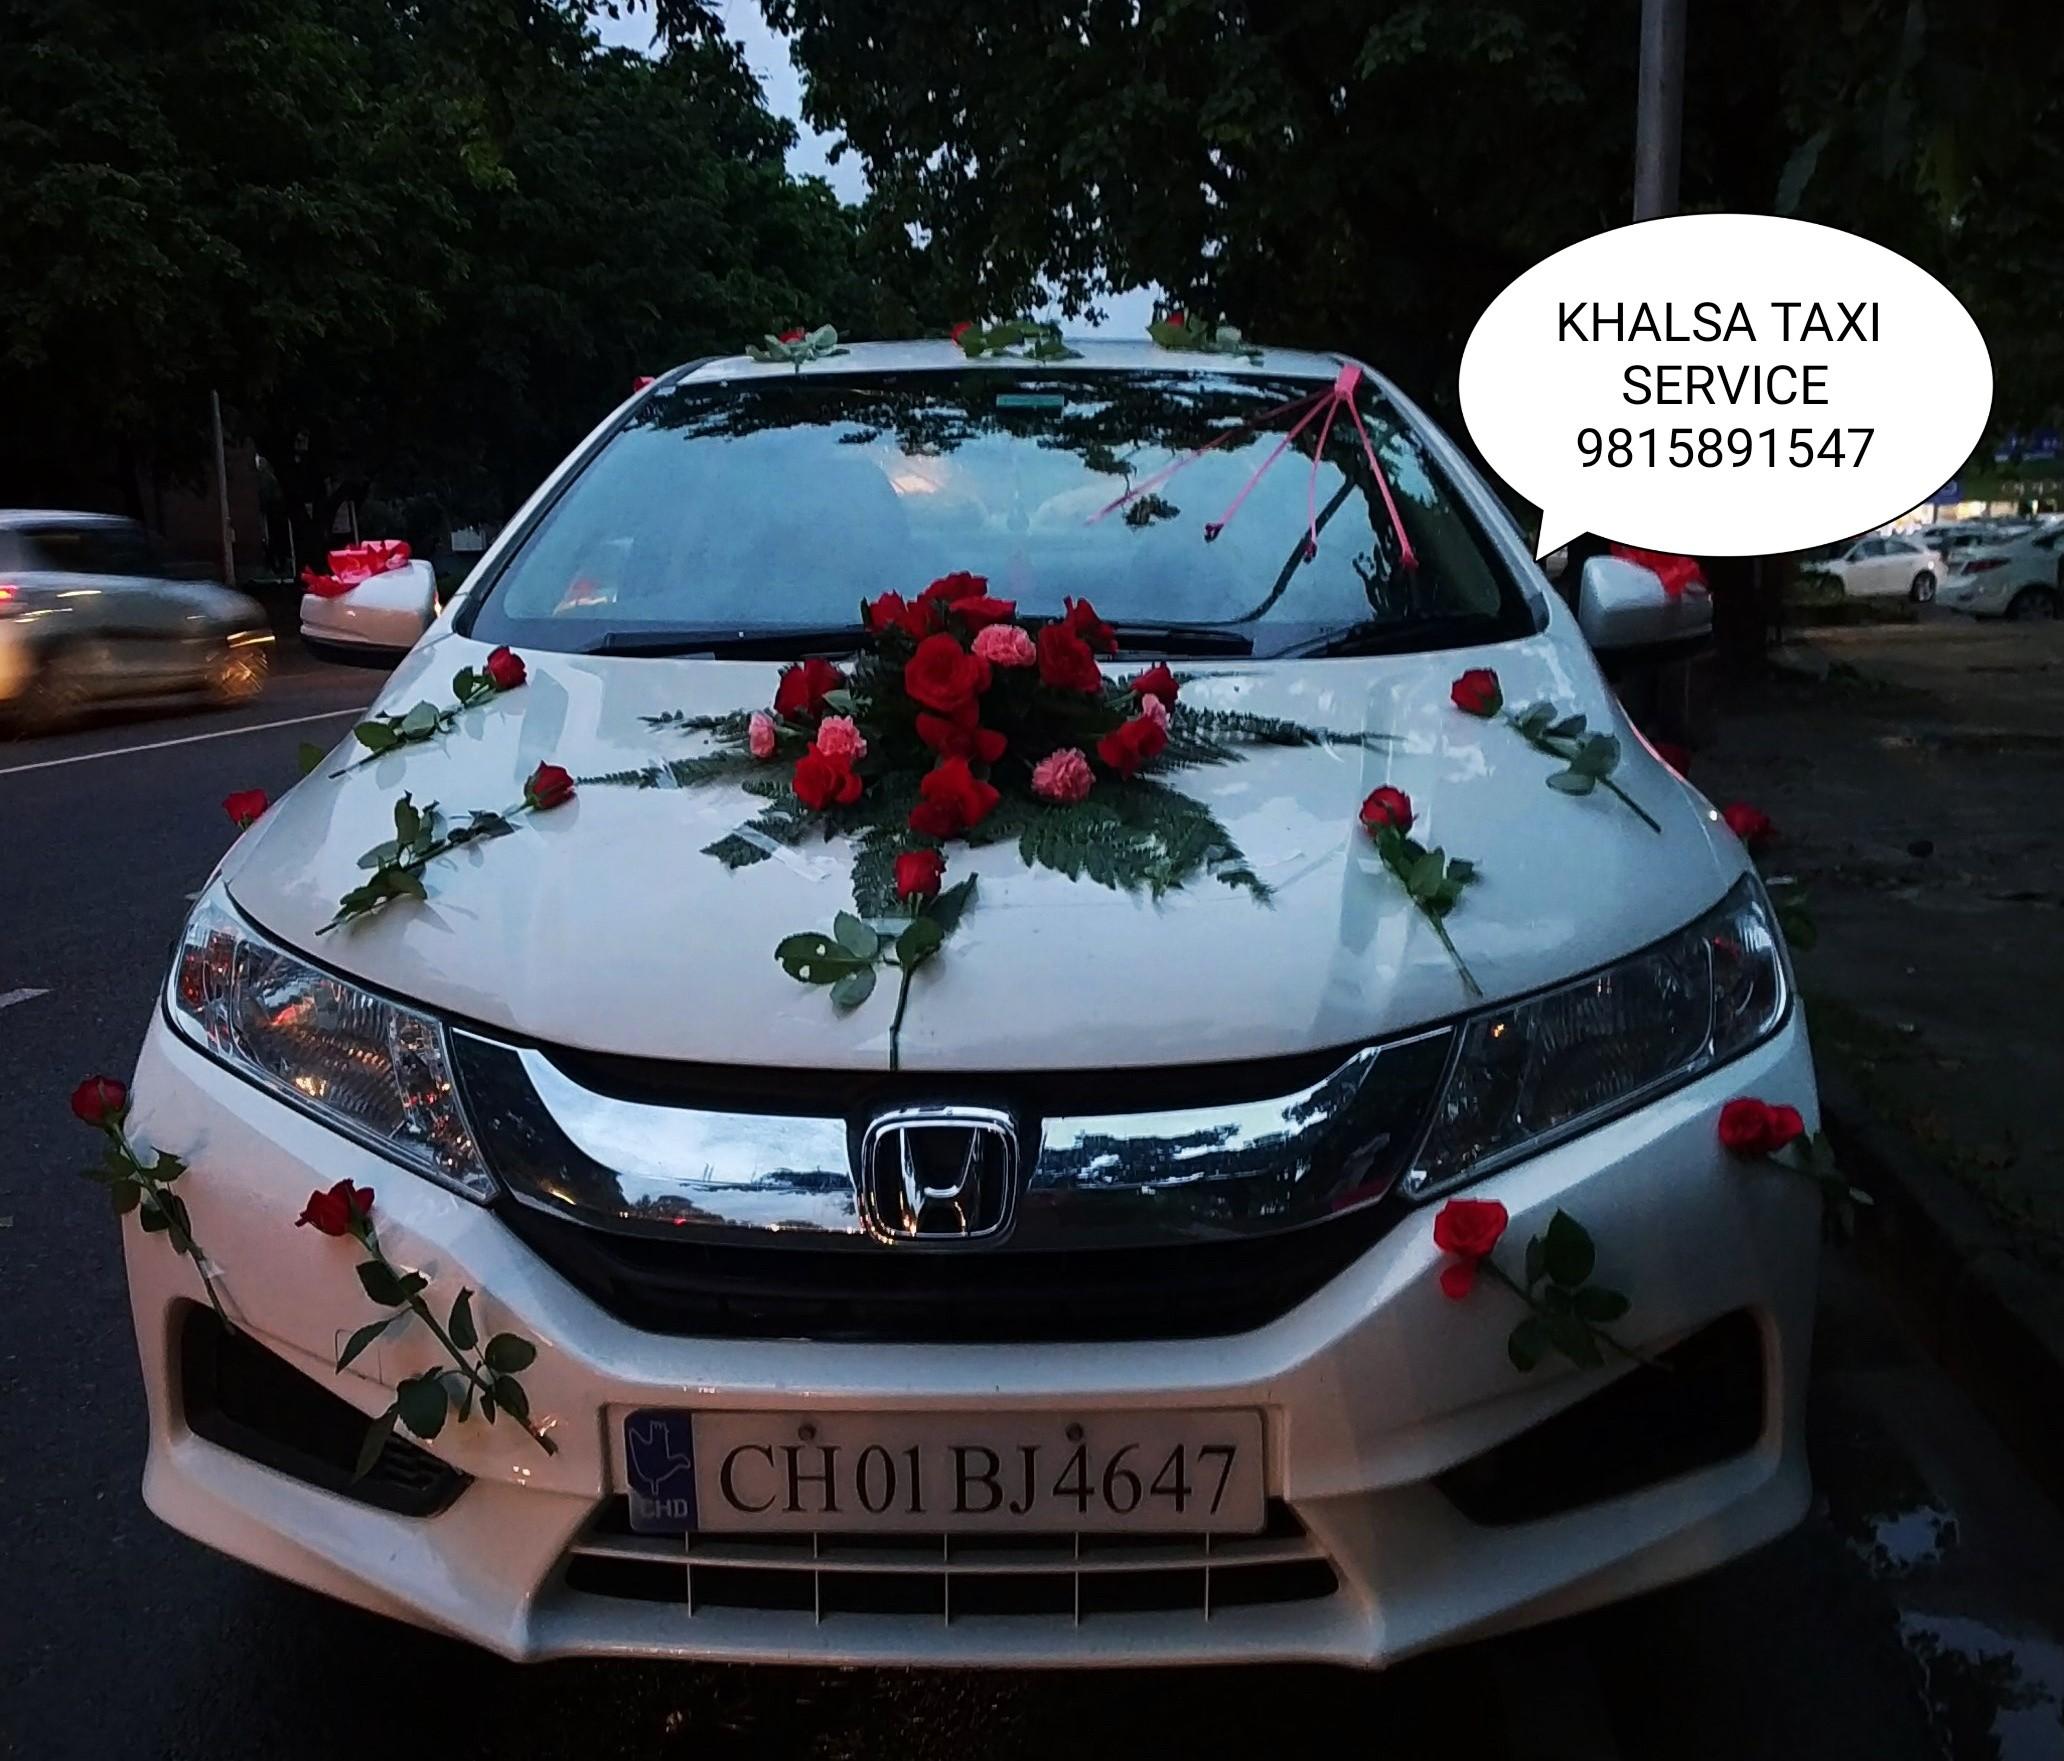 Luxury Doli Car Booking In Chandigarh